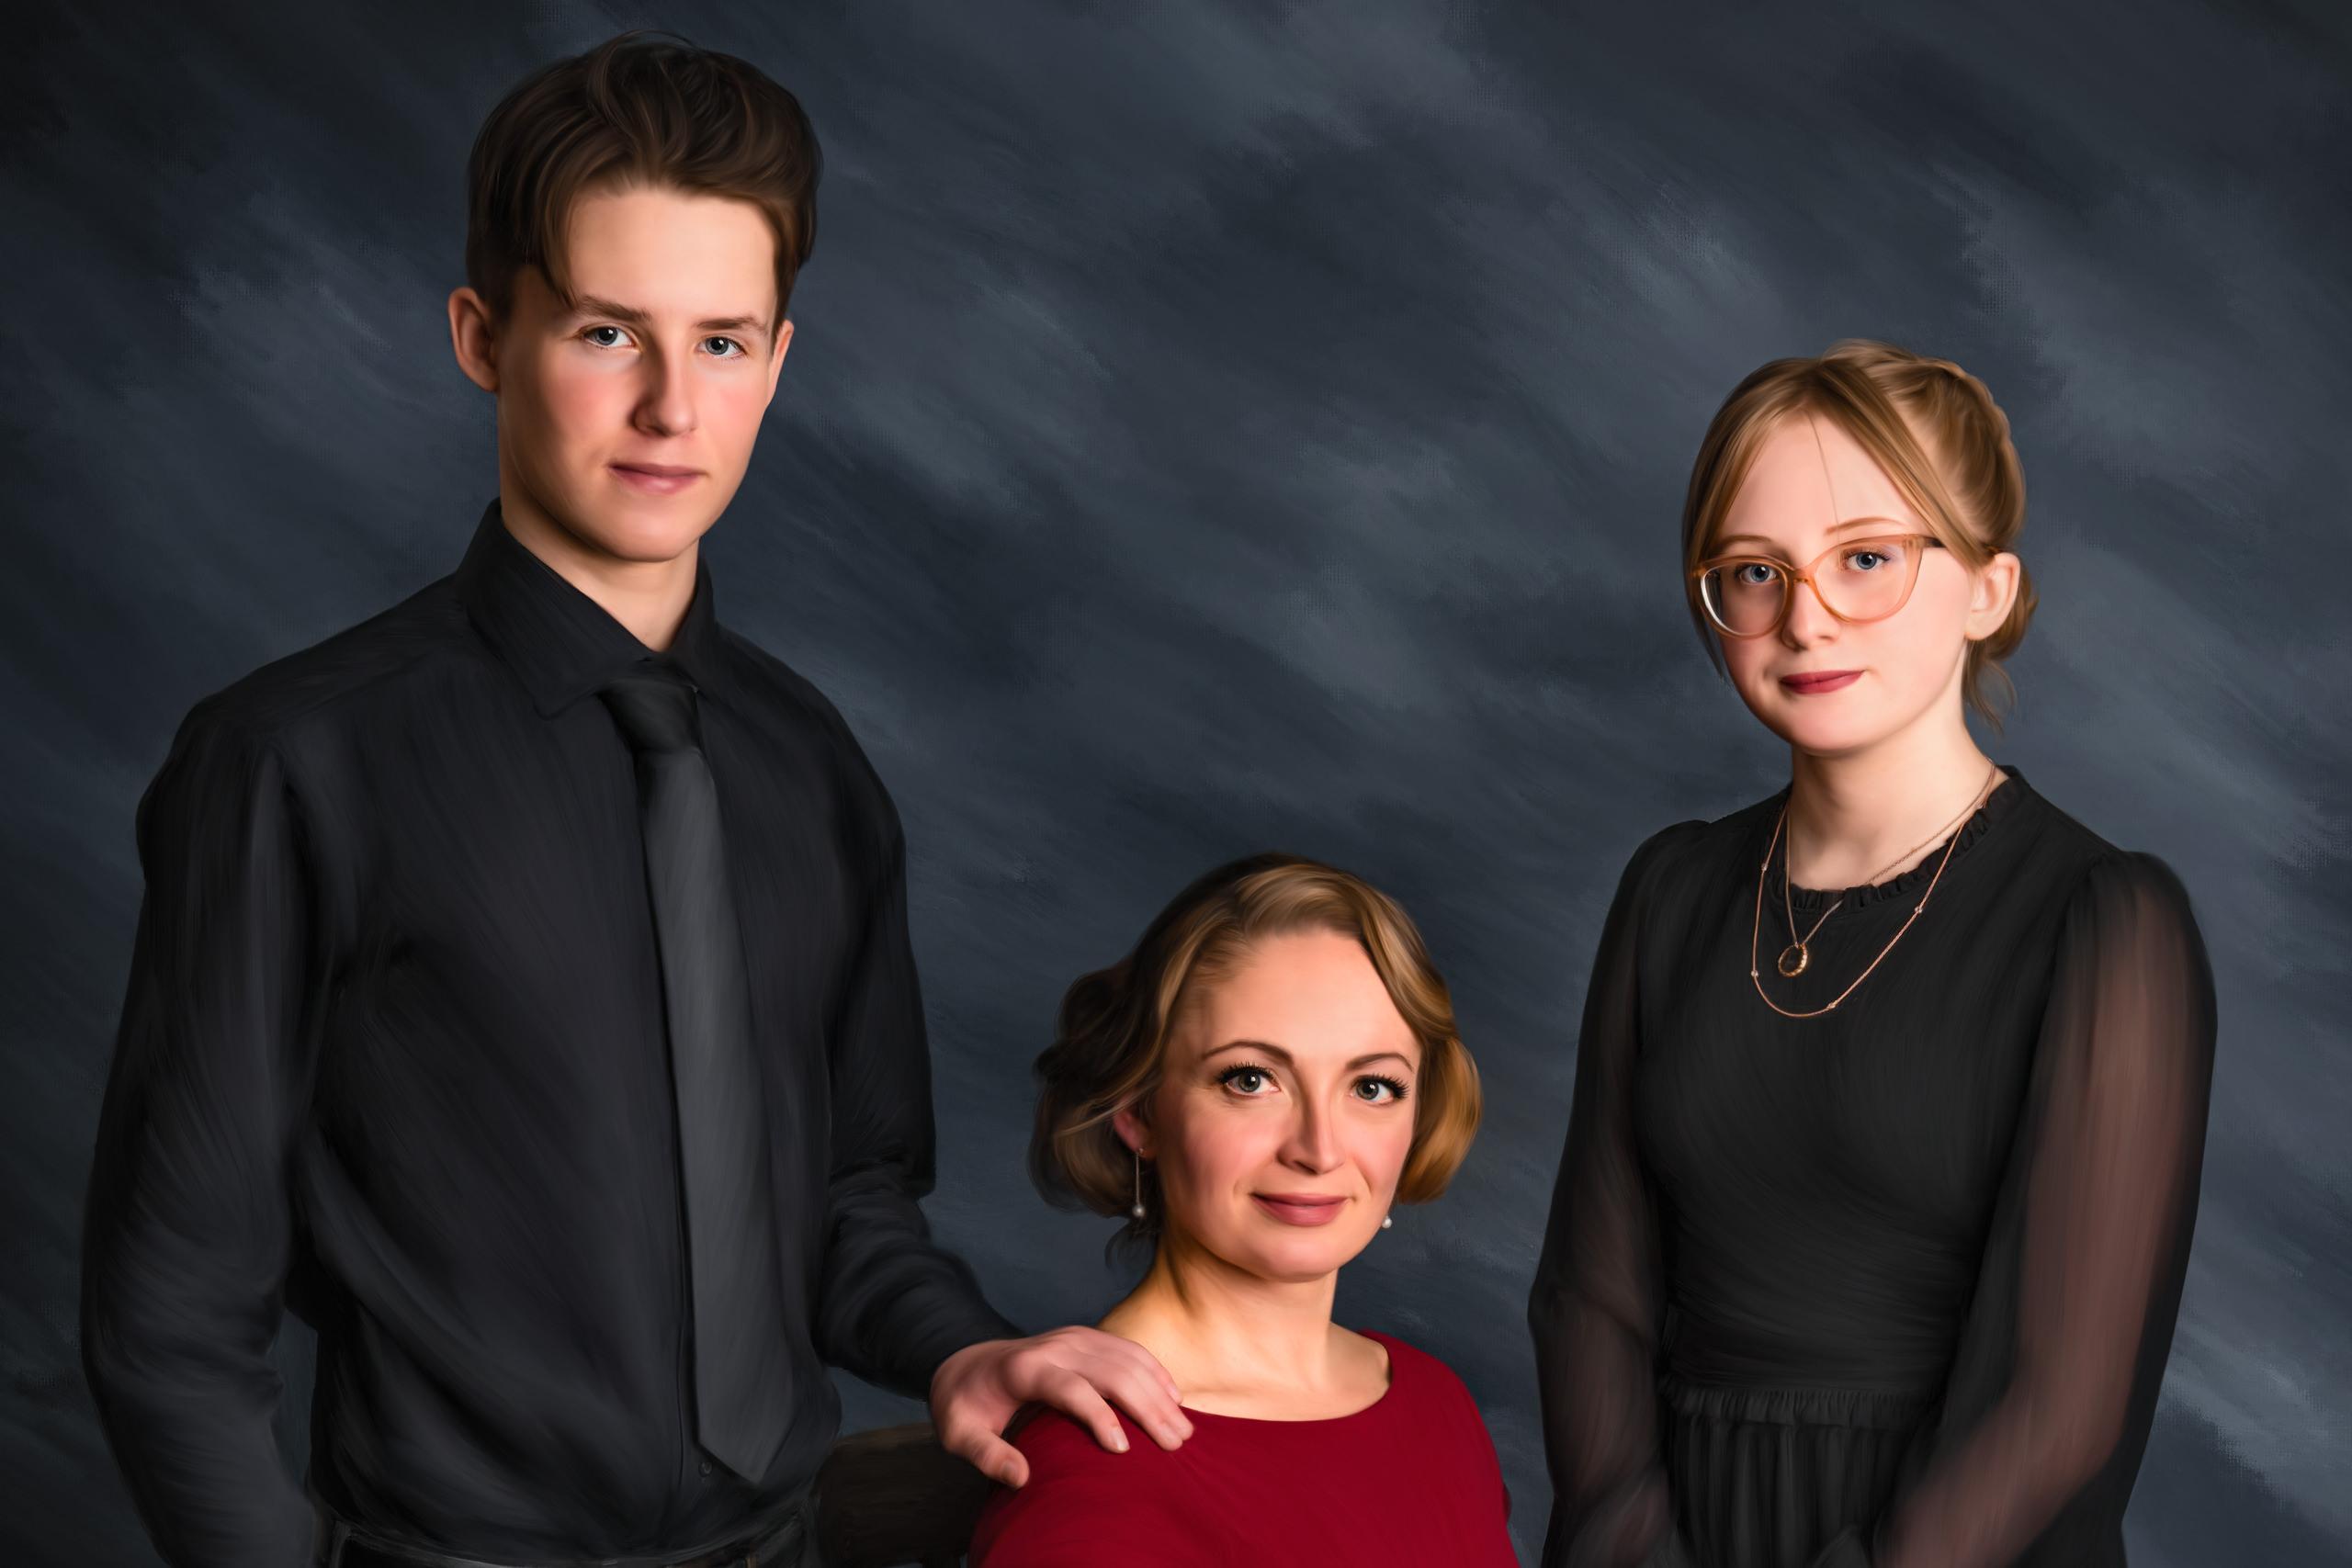 Fine art family portraiture by Sean LeBlanc